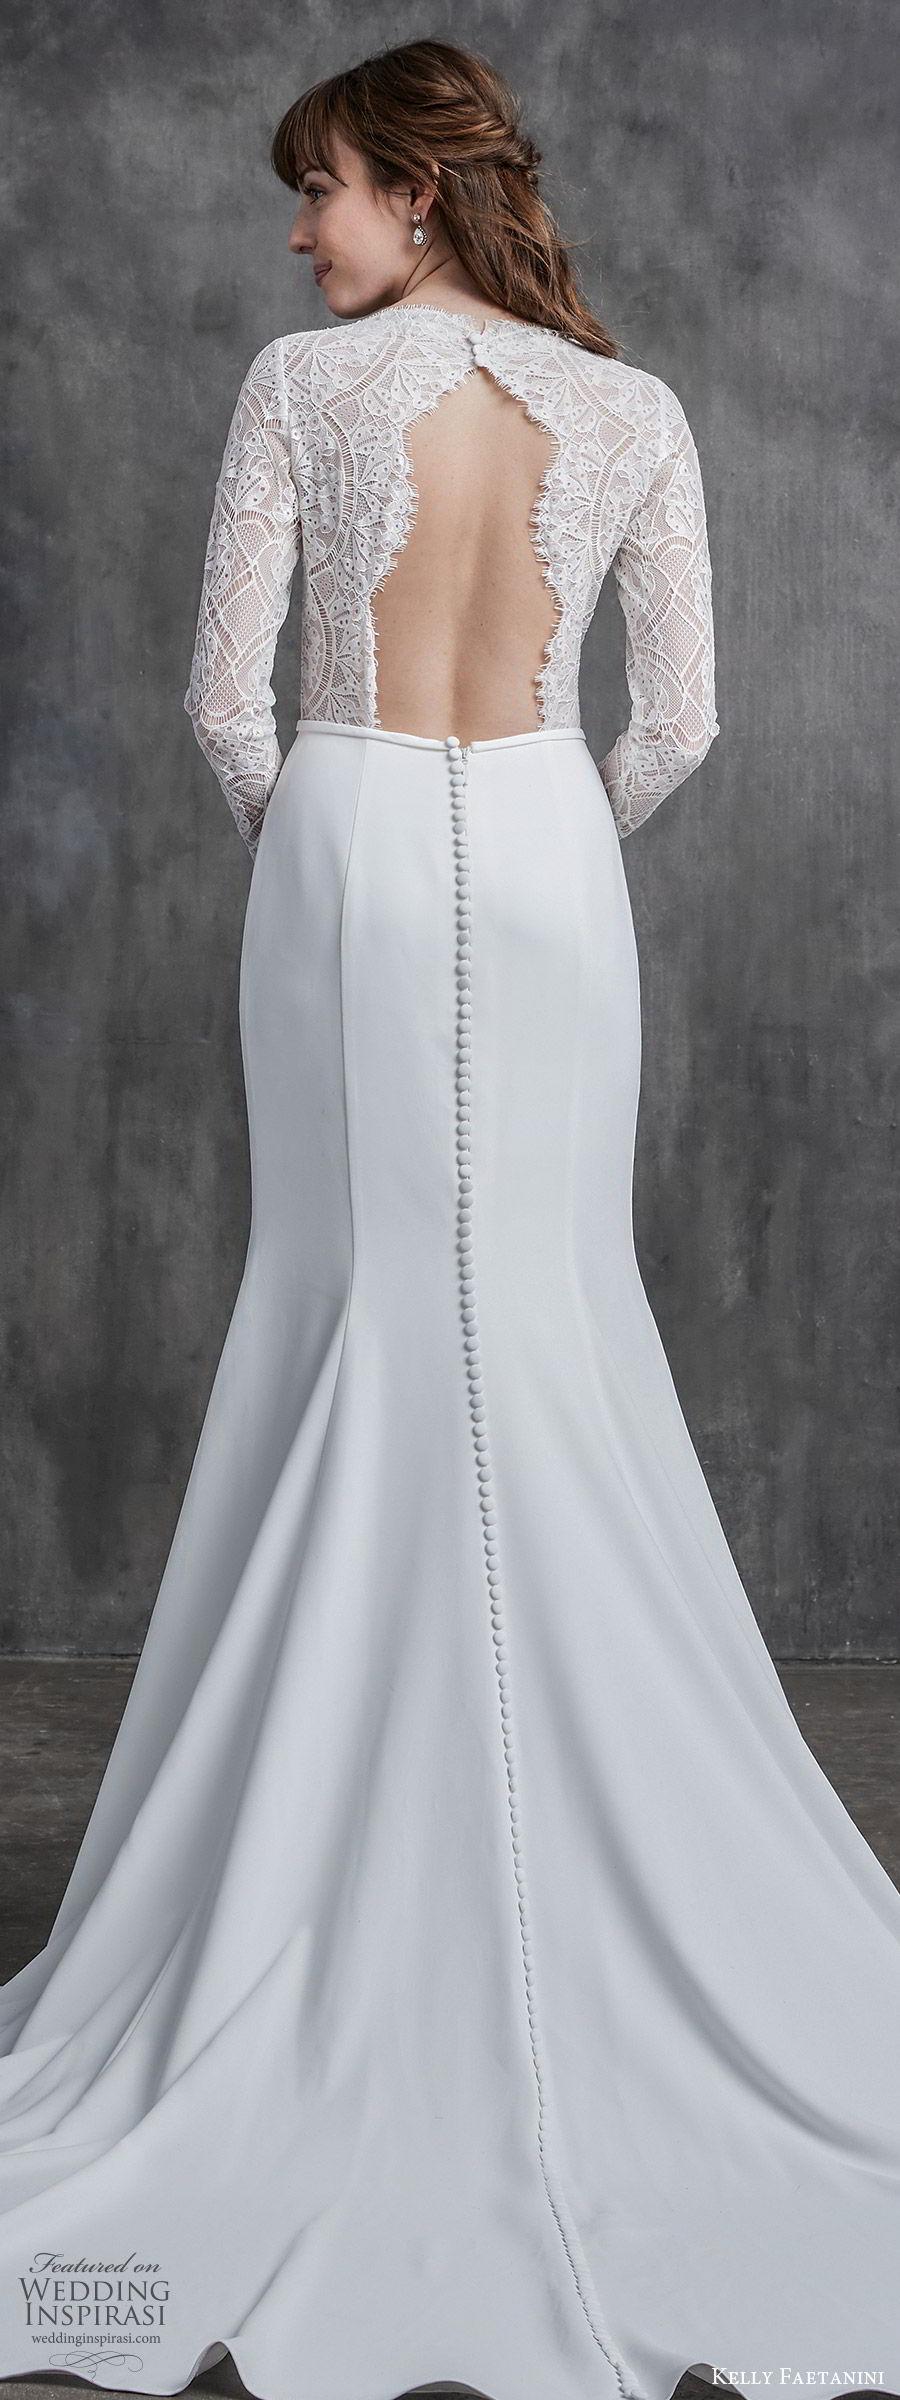 kelly faetanini spring 2020 bridal illusion long sleeves v neckline lace bodice fit flare modified a line mermaid wedding dress (2) chapel train elegant zbv